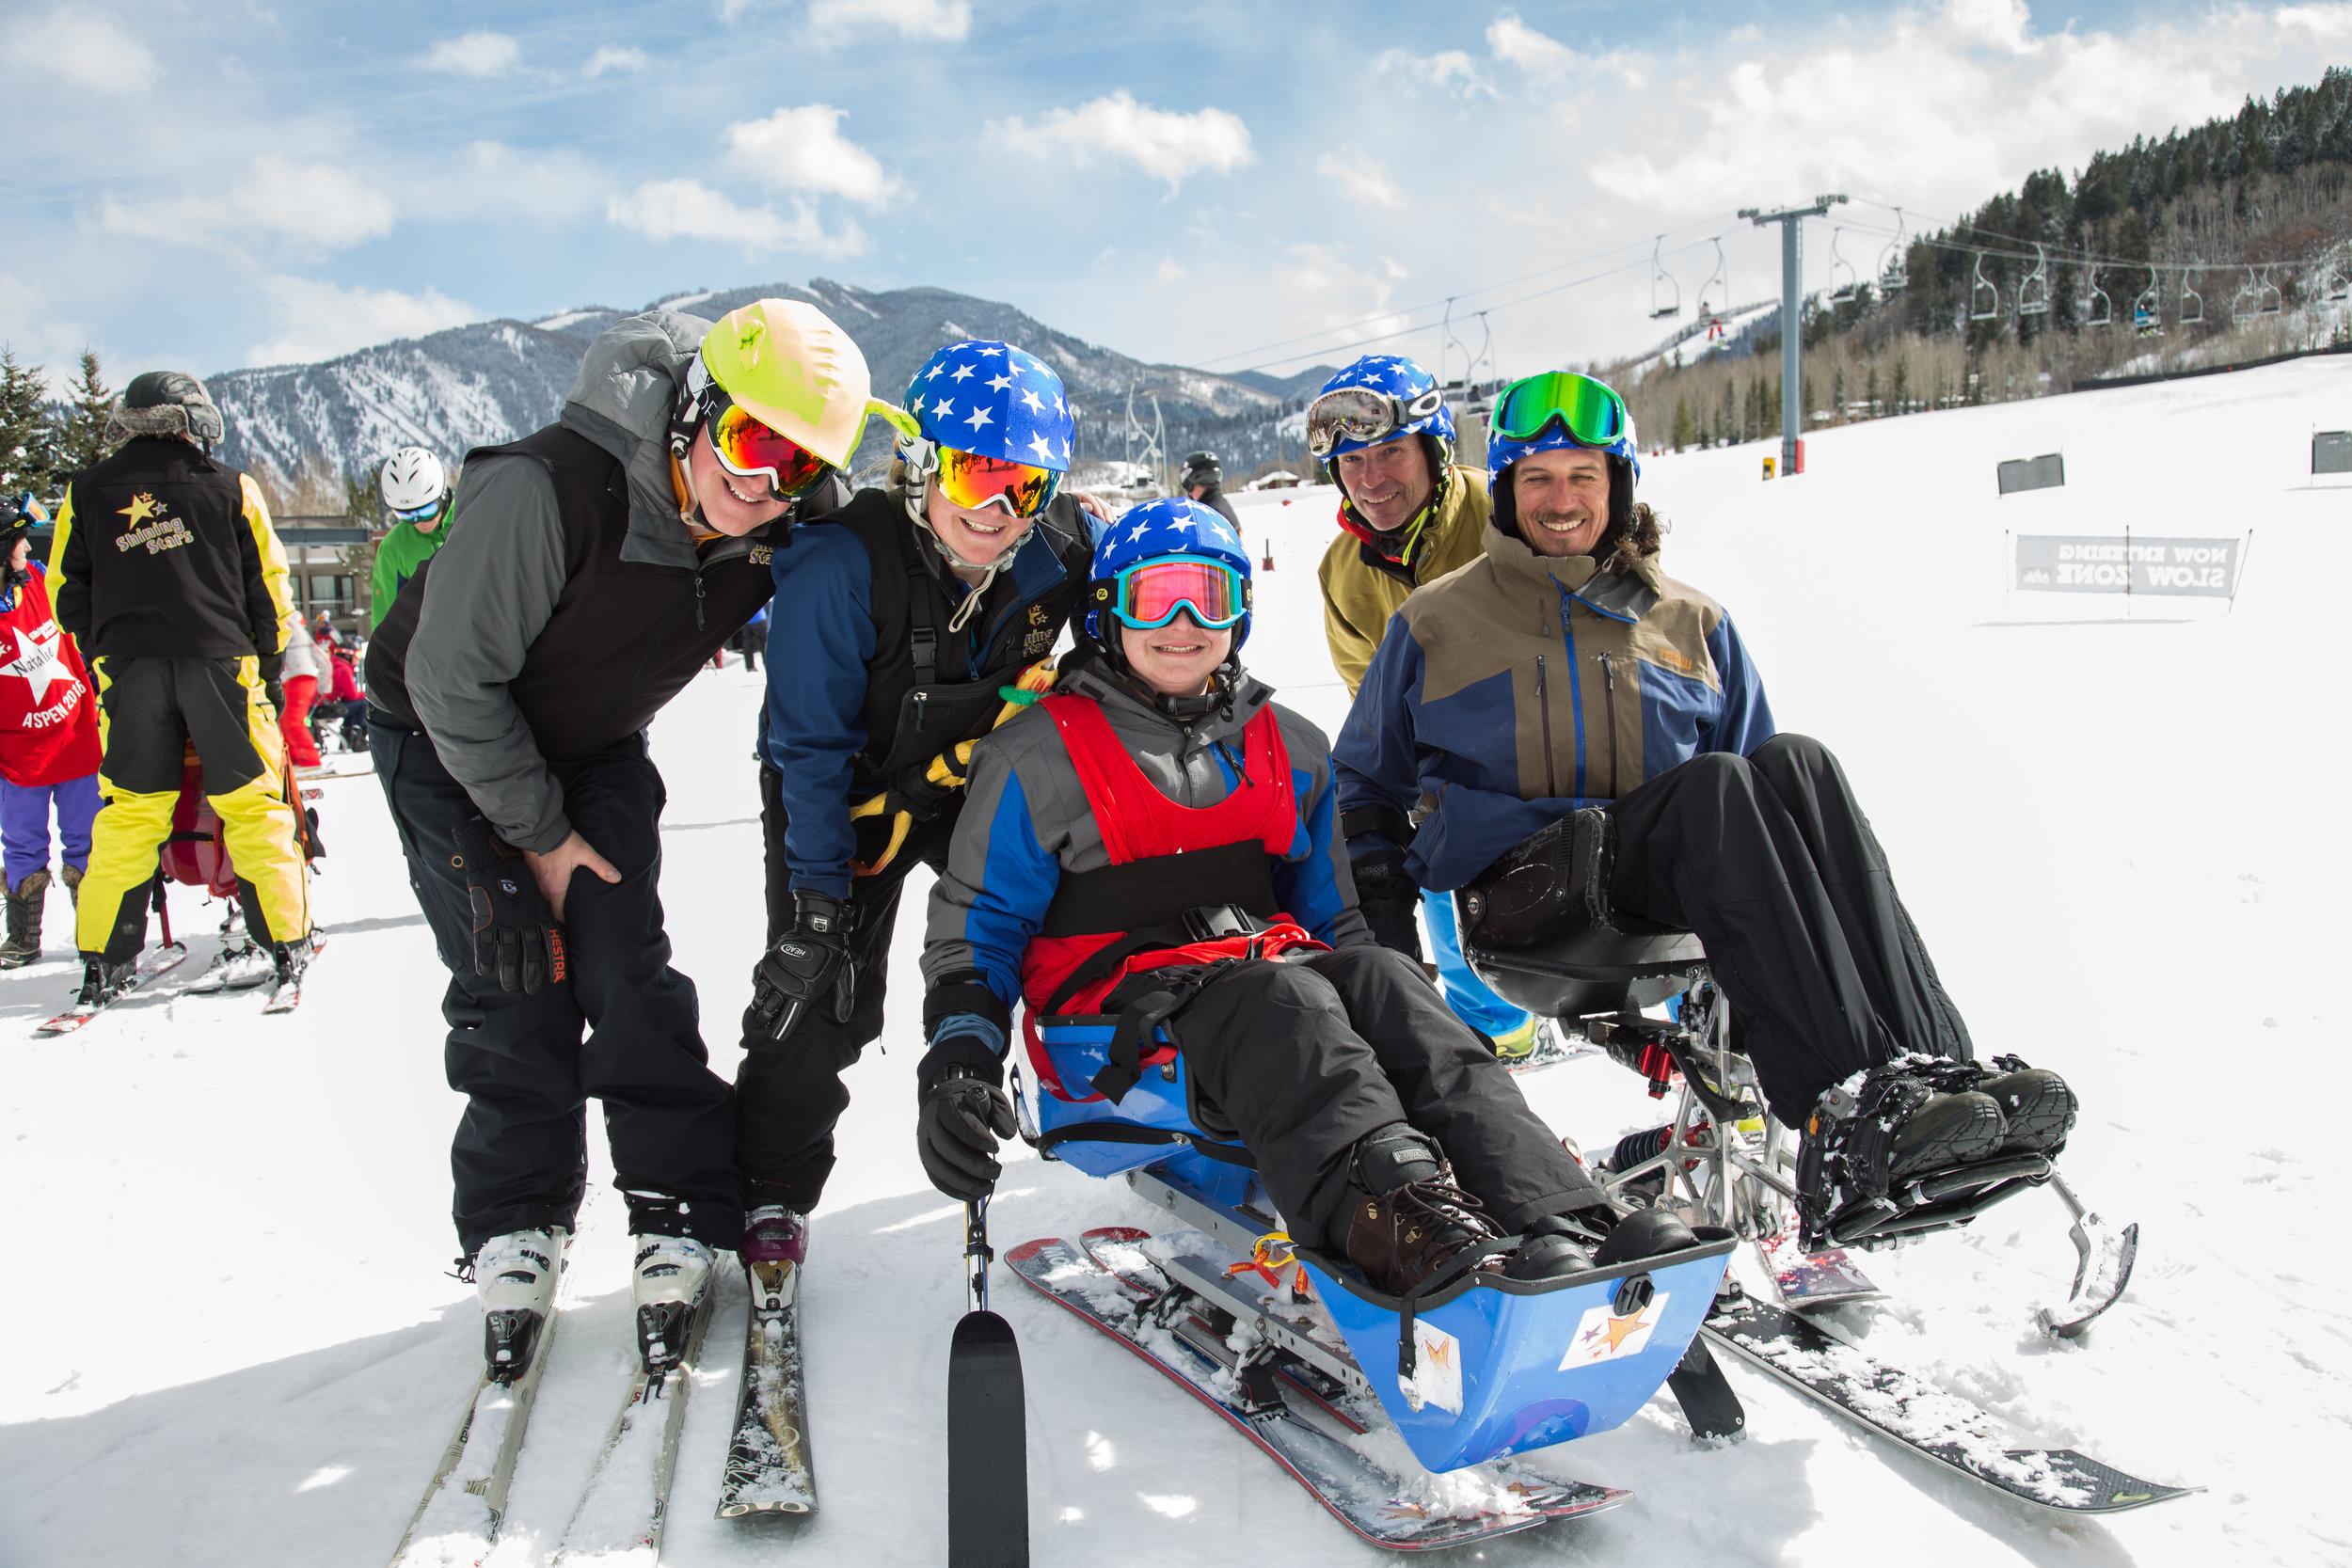 2016 Aspen Winter Games pt. 1